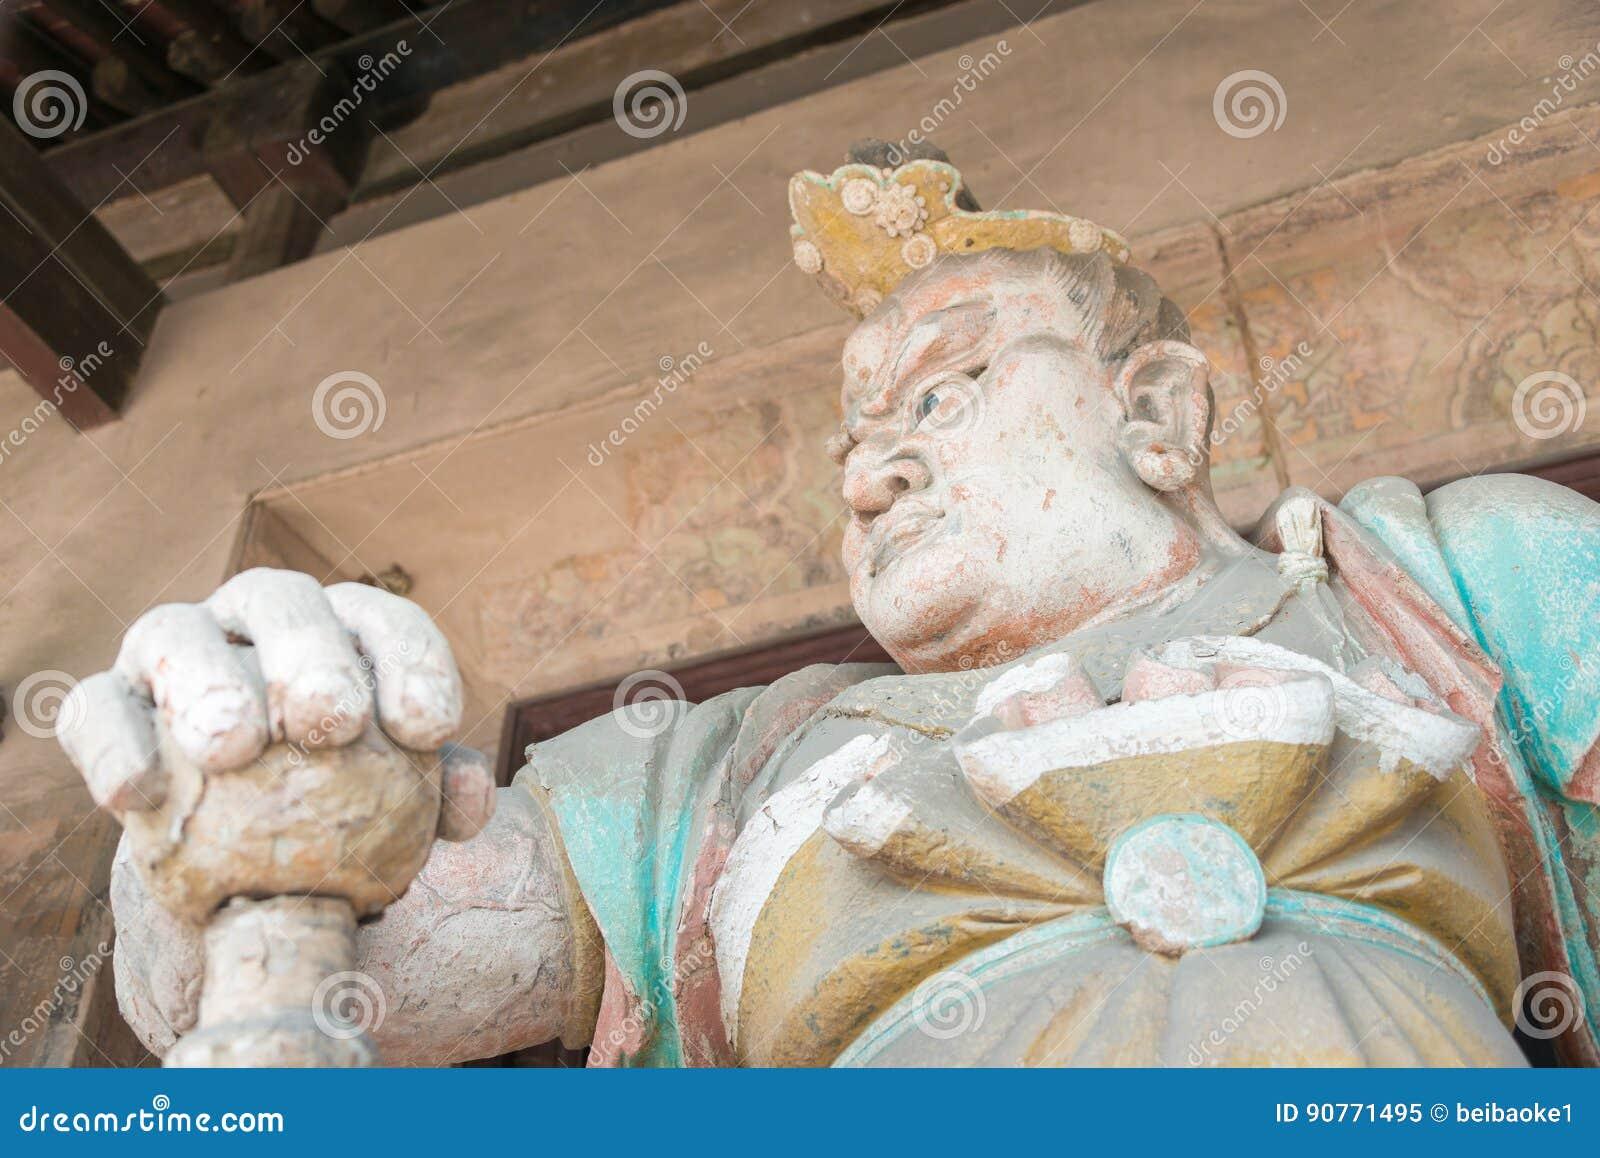 ШАНЬСИ, КИТАЙ - SEPT. 03 2015: Статуя Budda на виске Shuanglin (u